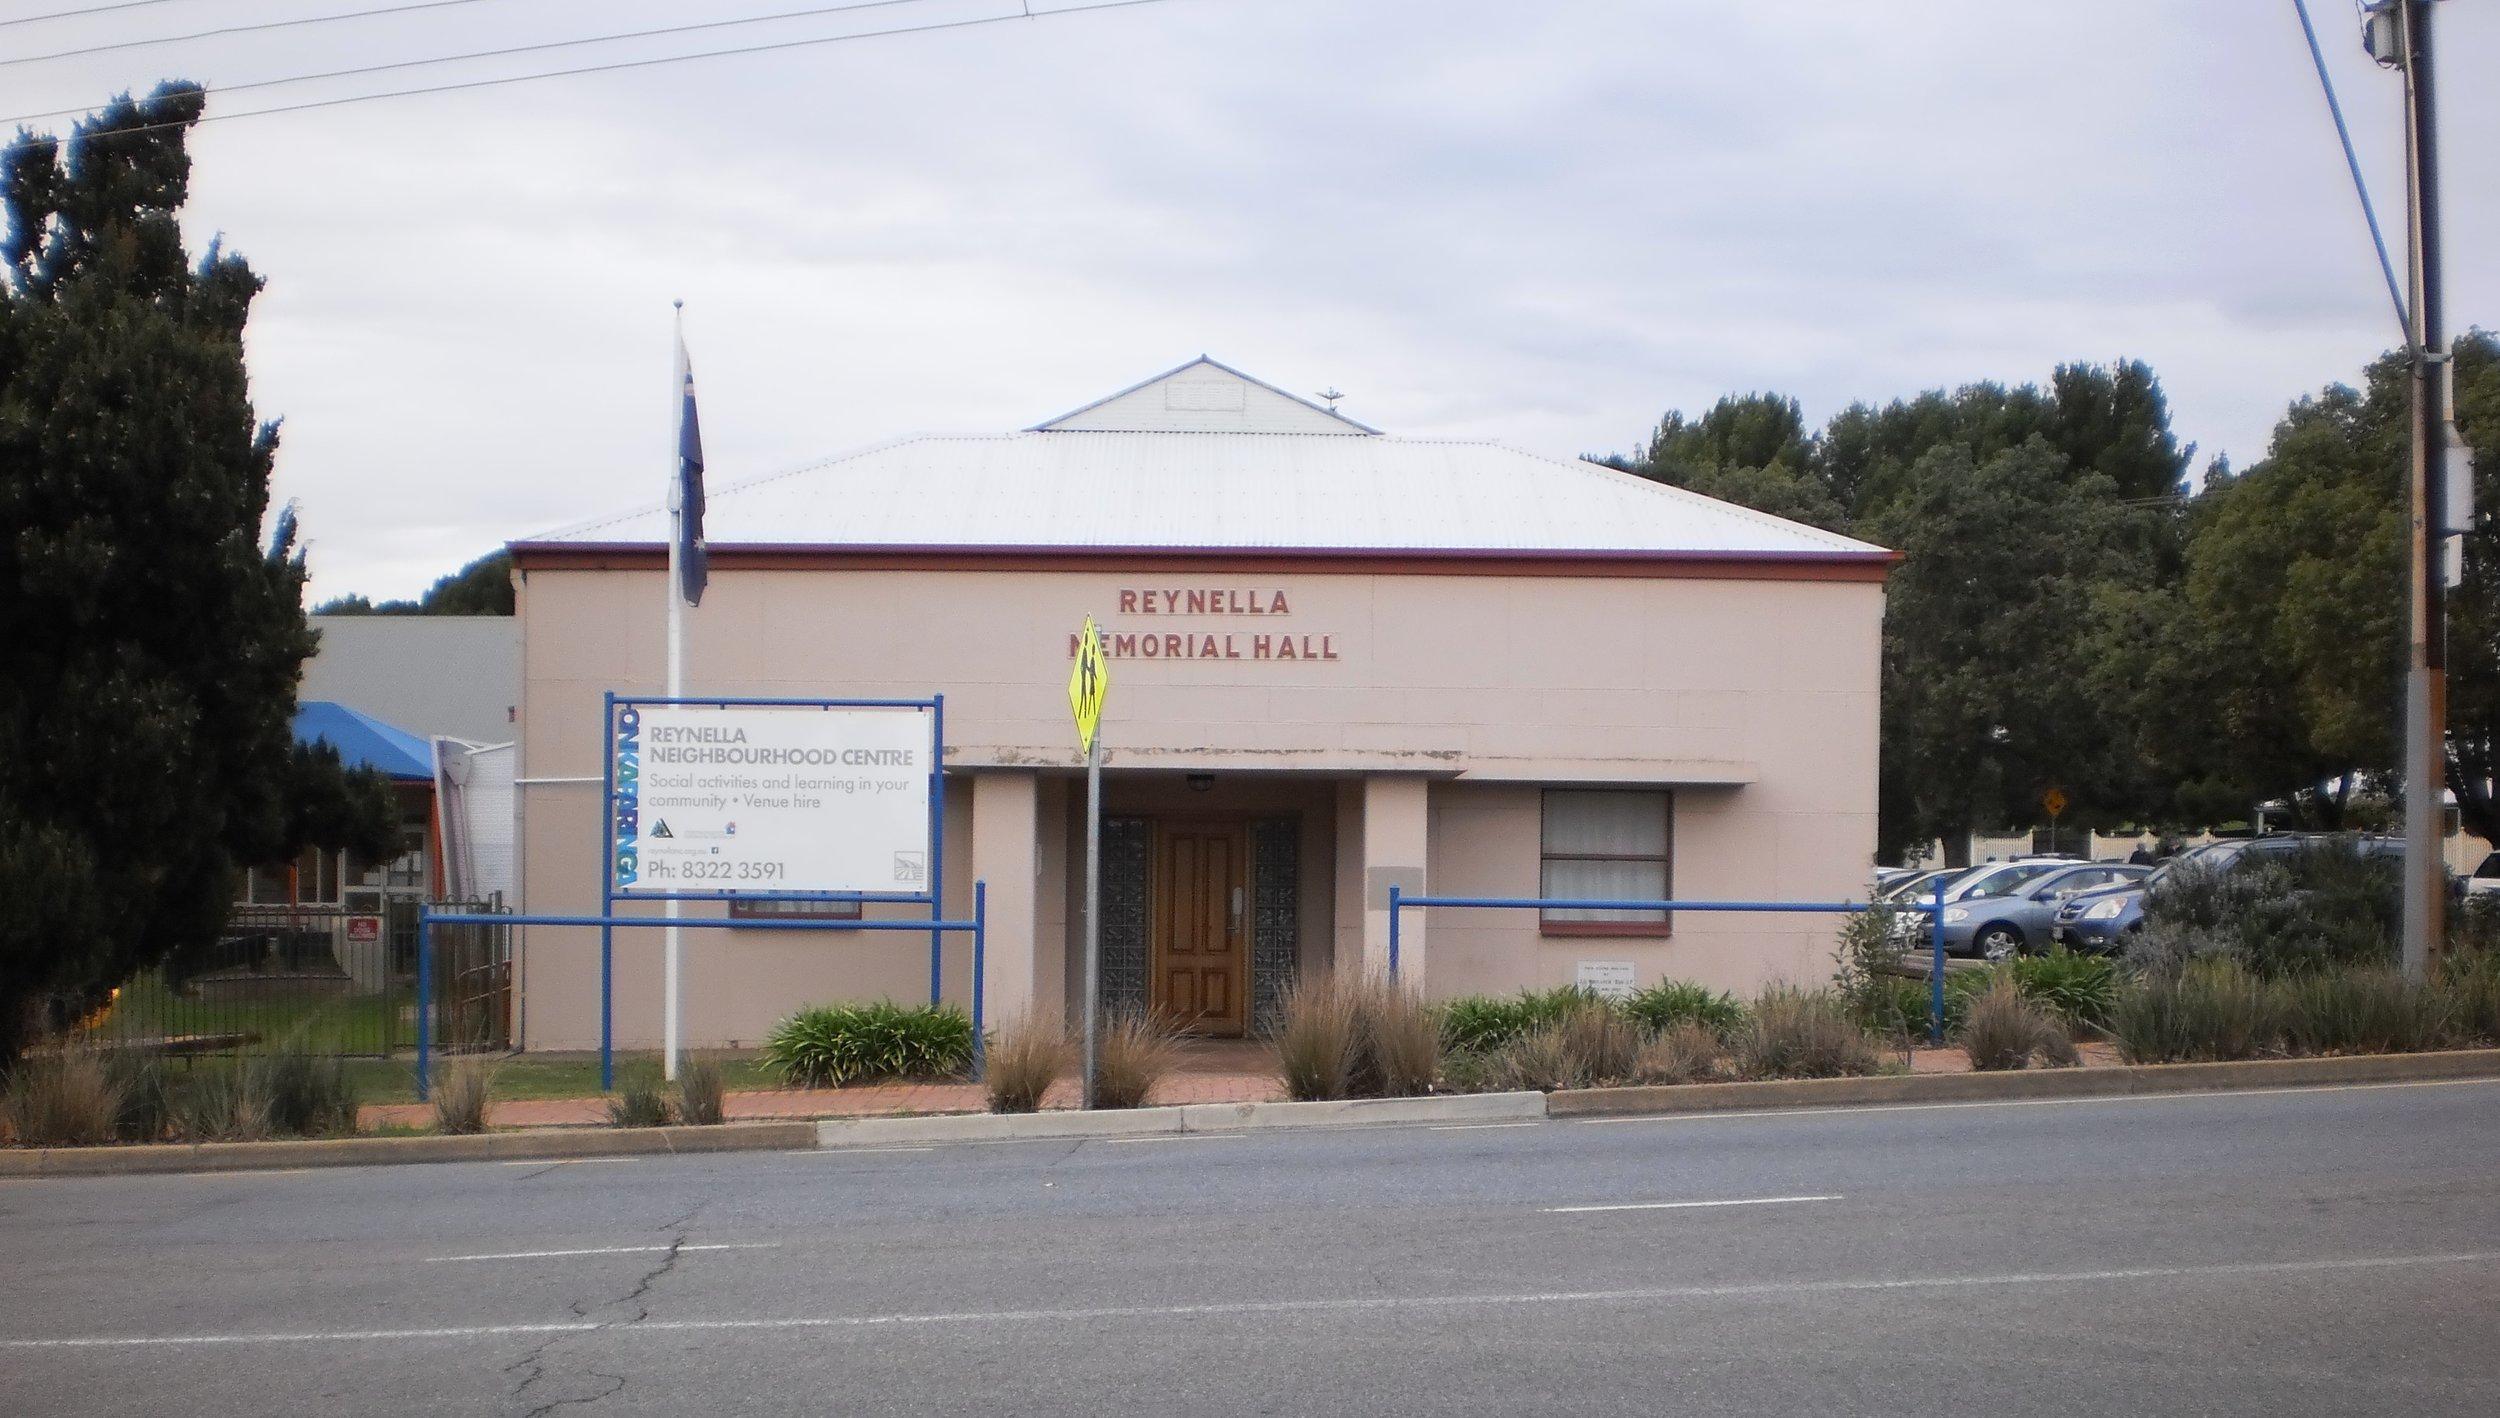 Reynella Neighbourhood Centre